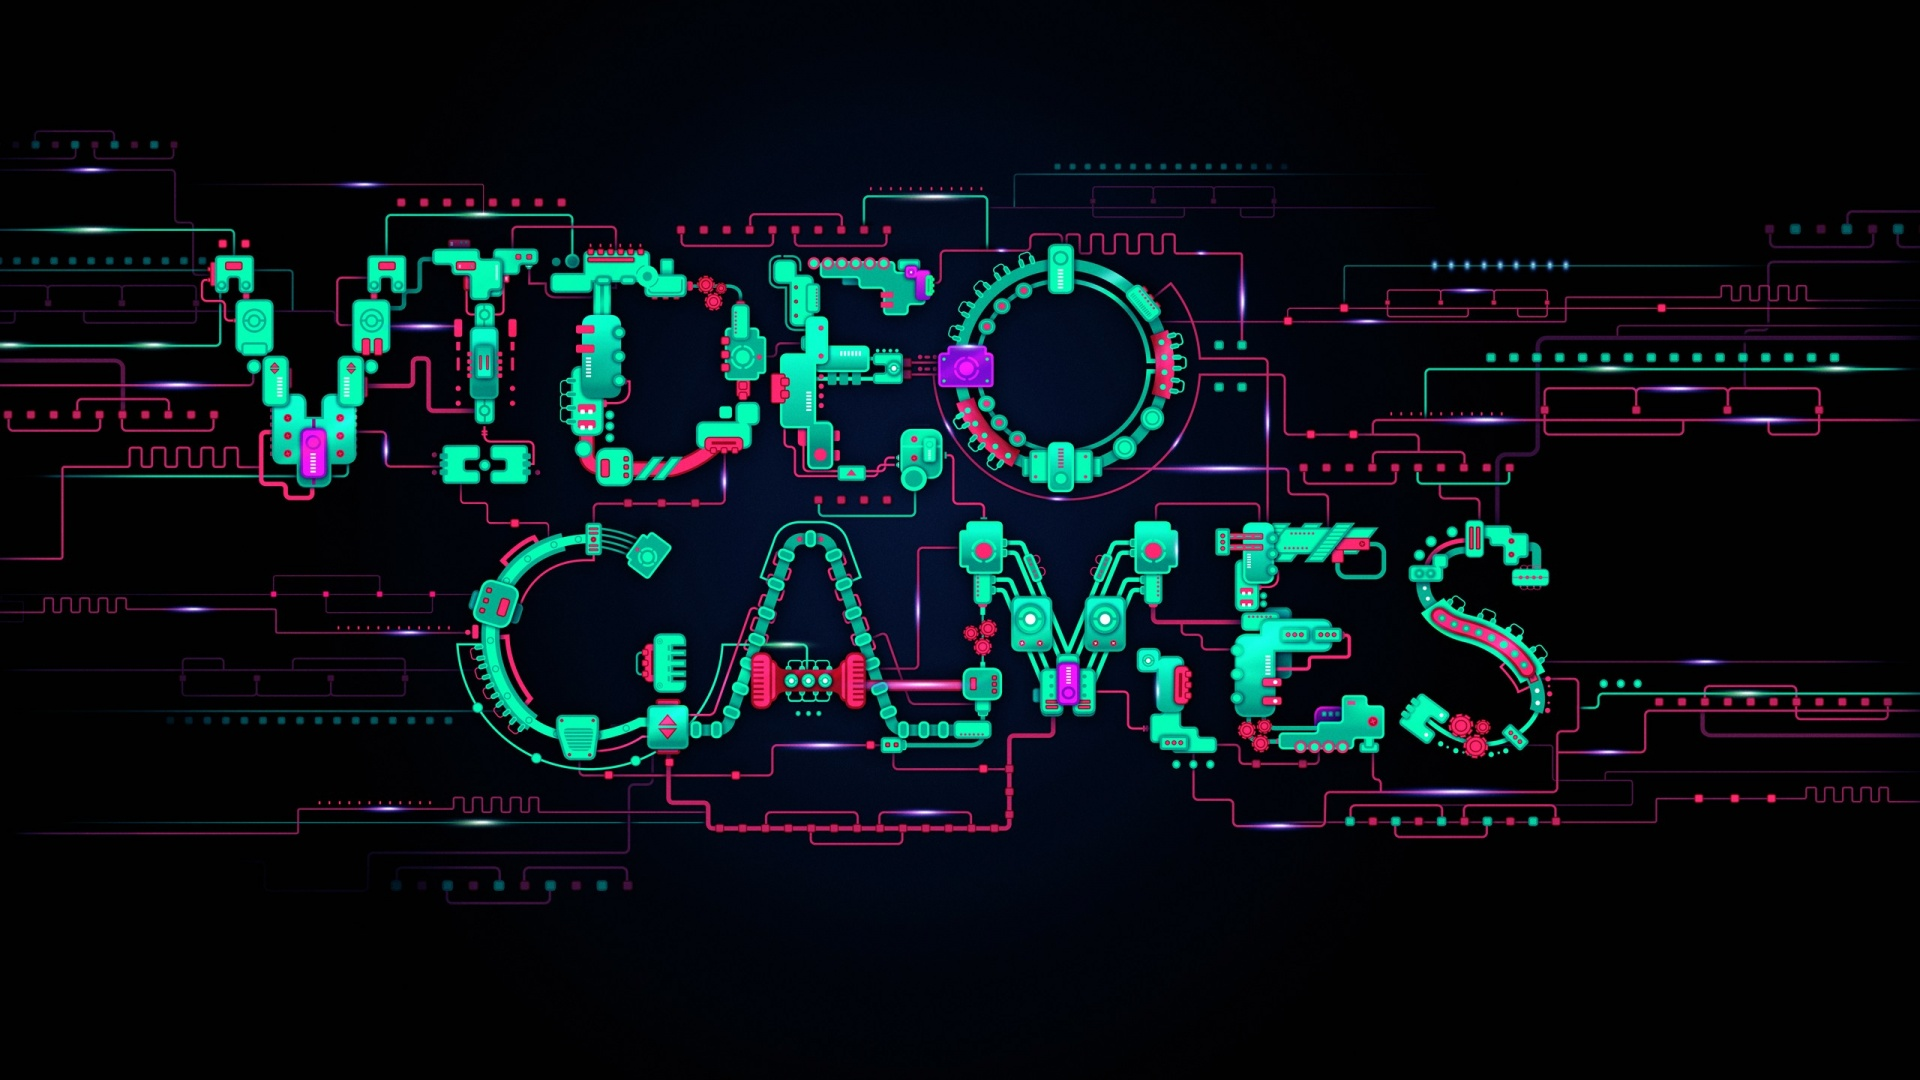 [38+] Gaming Wallpapers 1920x1080 on WallpaperSafari